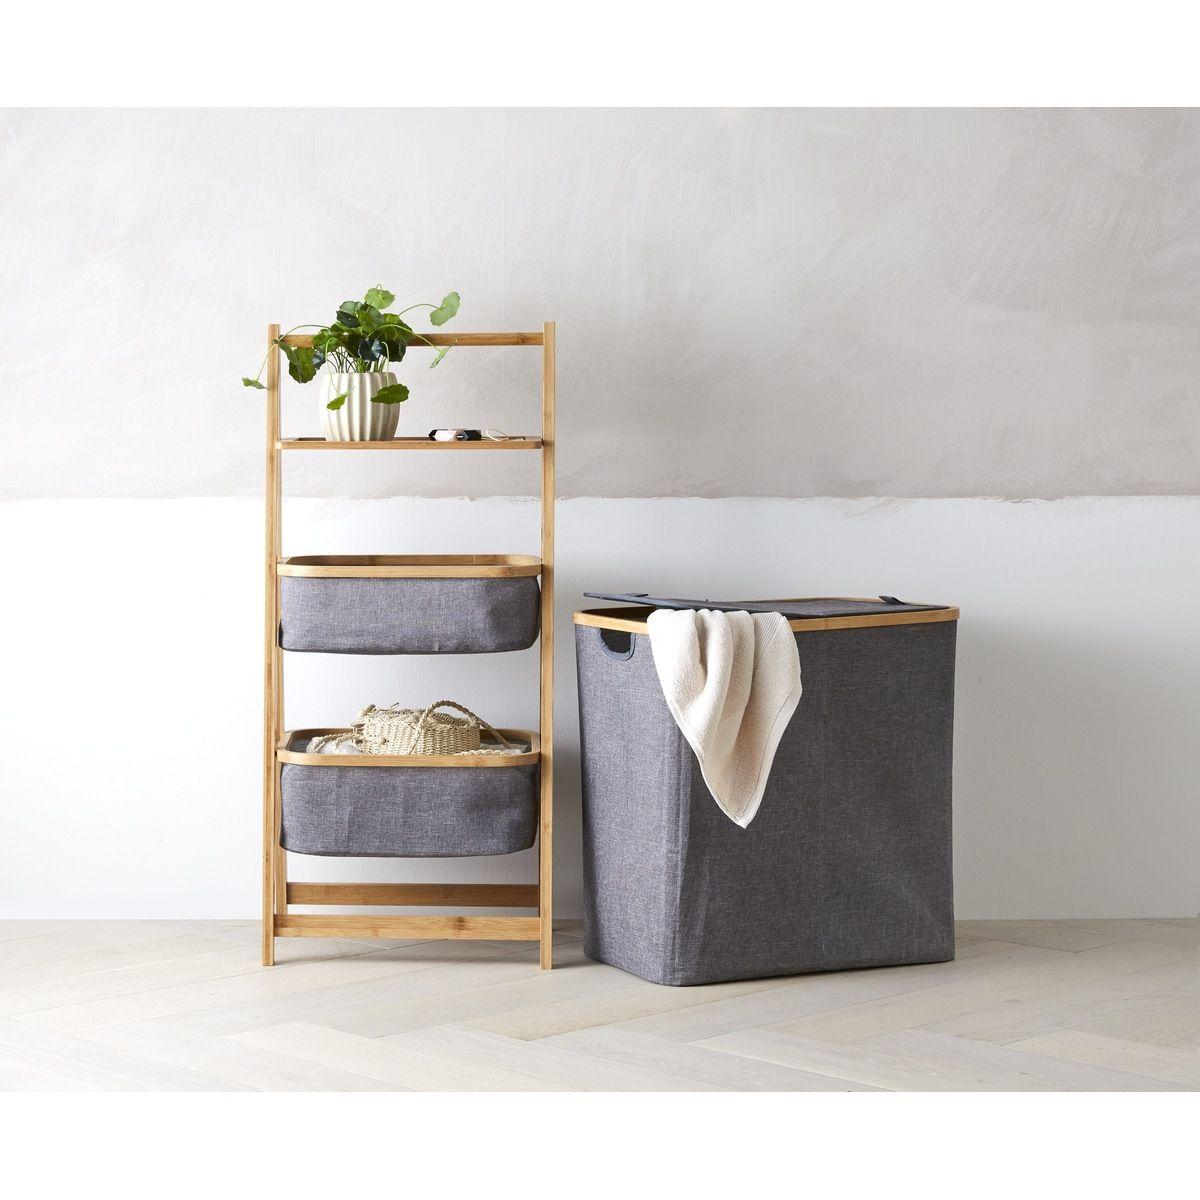 3 Tier Storage Caddy With Bamboo Frame Kmartnz Storage Caddy Bamboo Frame Laundry Hamper